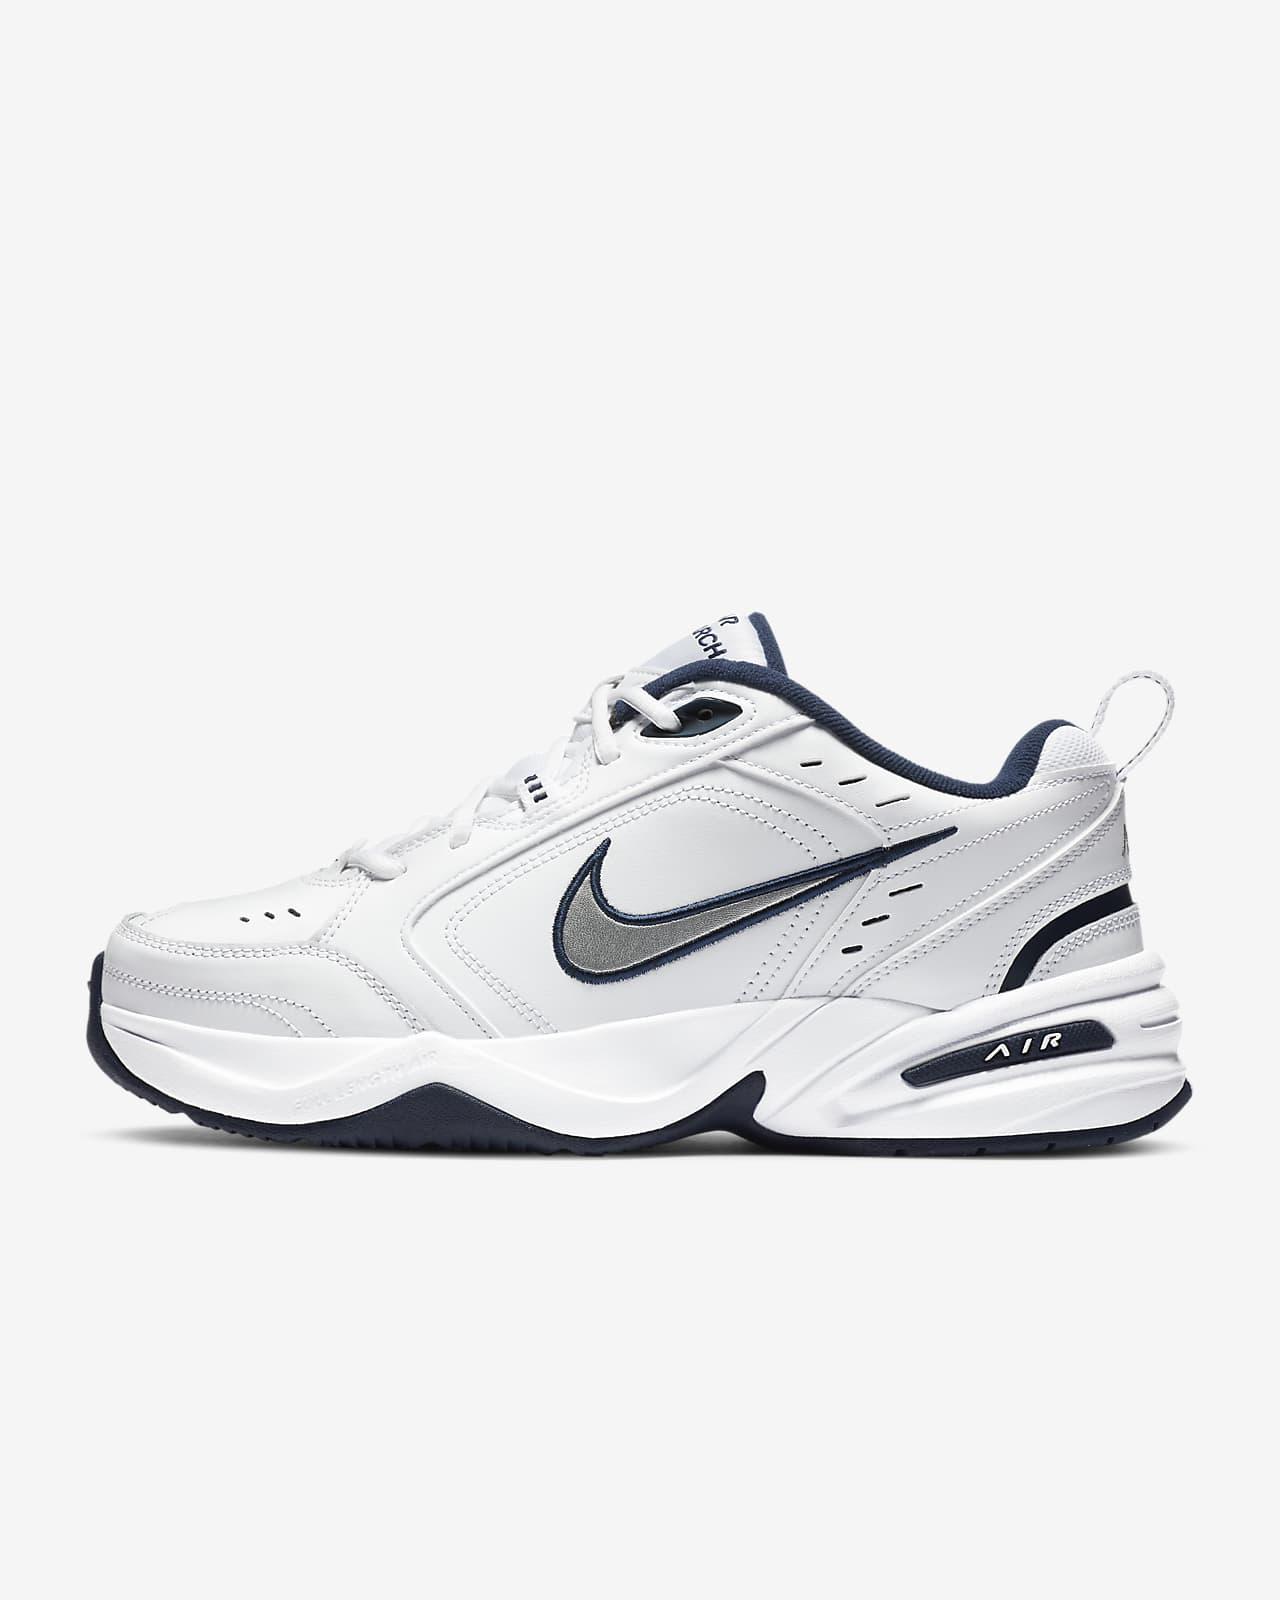 Nike Air Monarch IV Men's Training Shoe